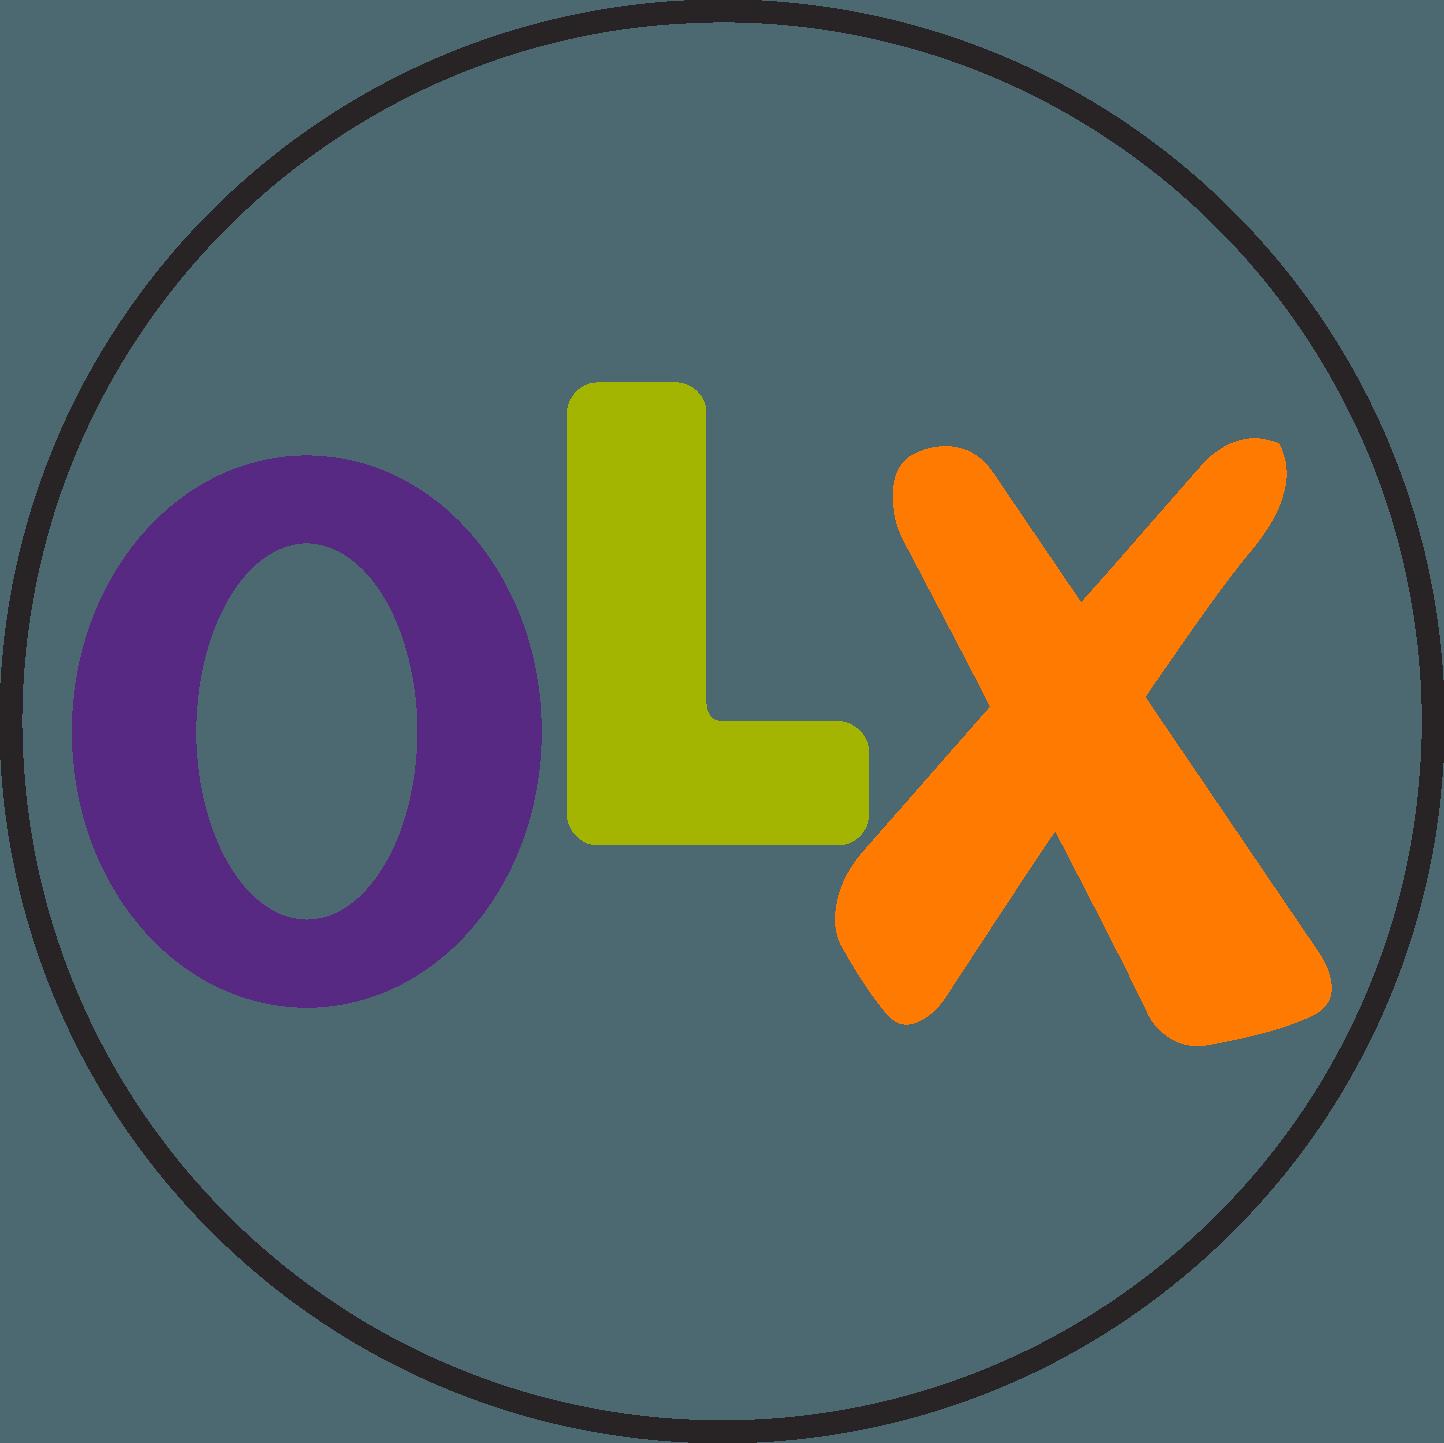 olx logo freelogovectors.net  vector